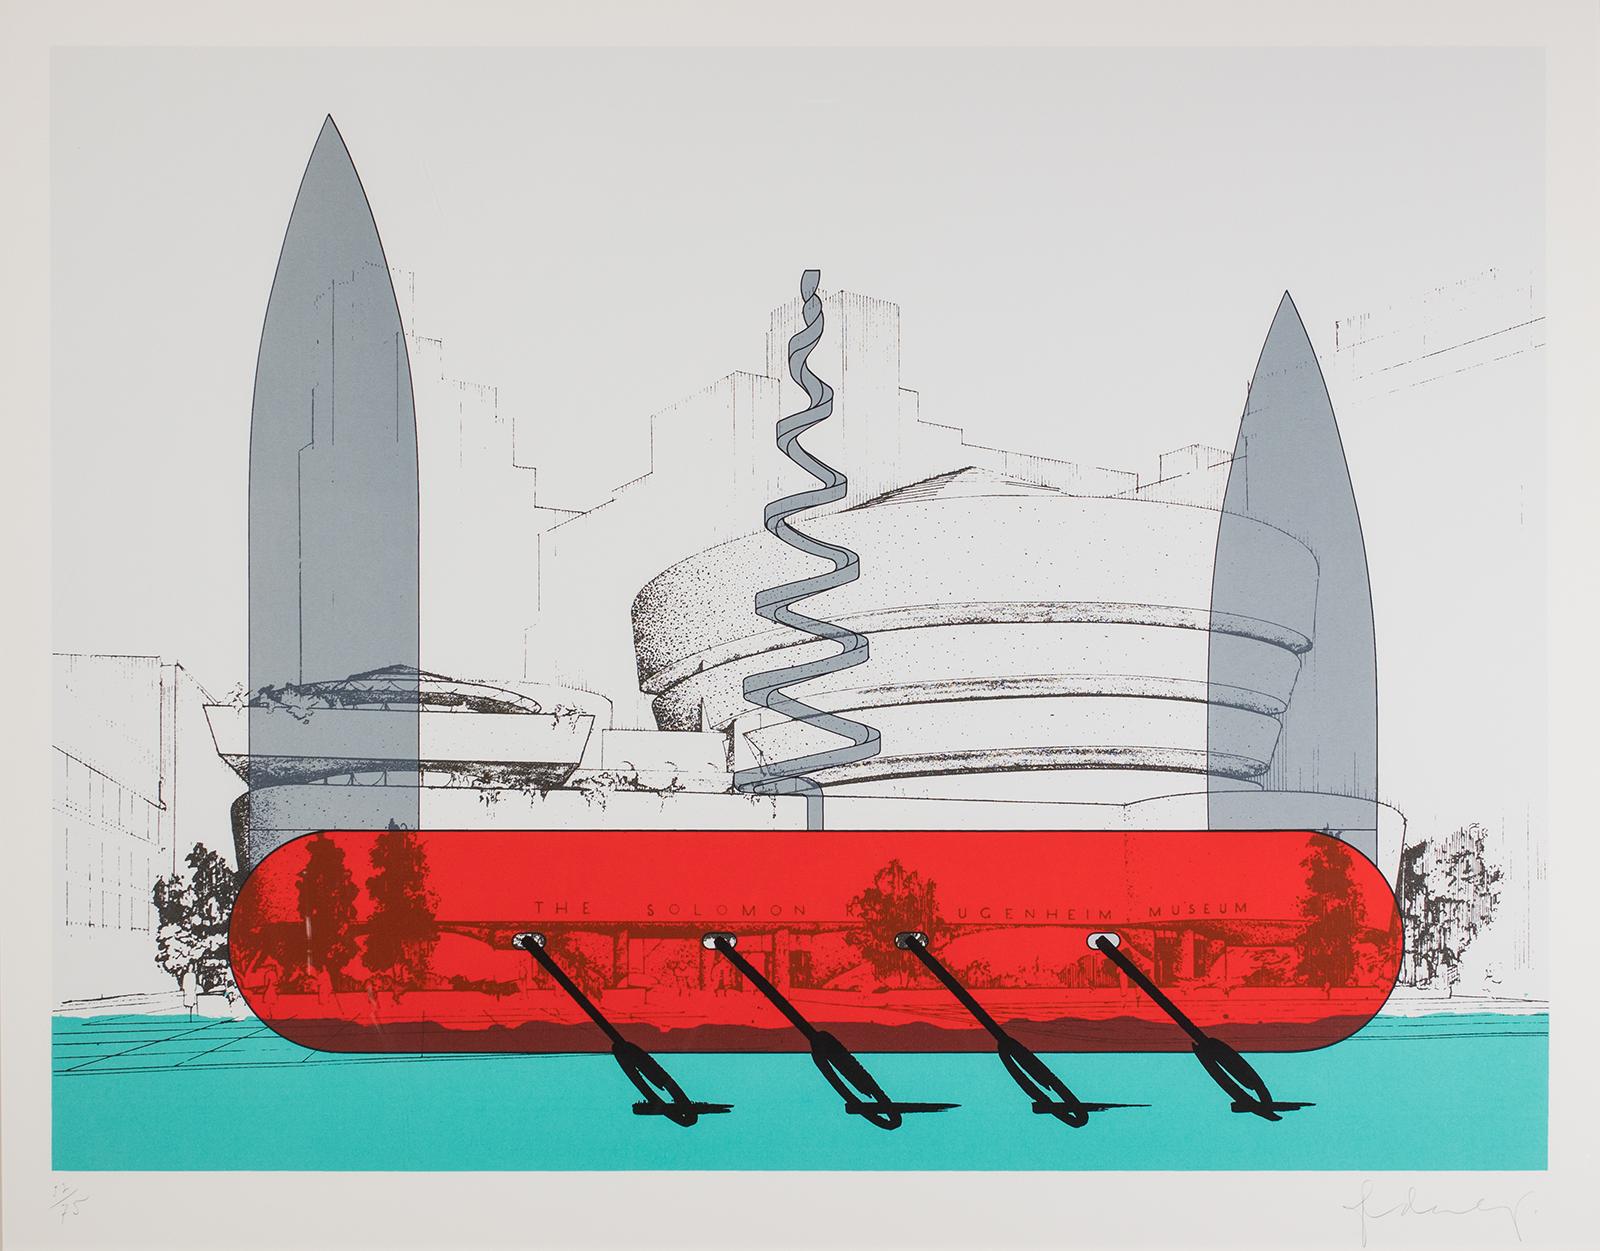 Claes Oldenburg, Knife Ship Superimposed on the Guggenheim Museu